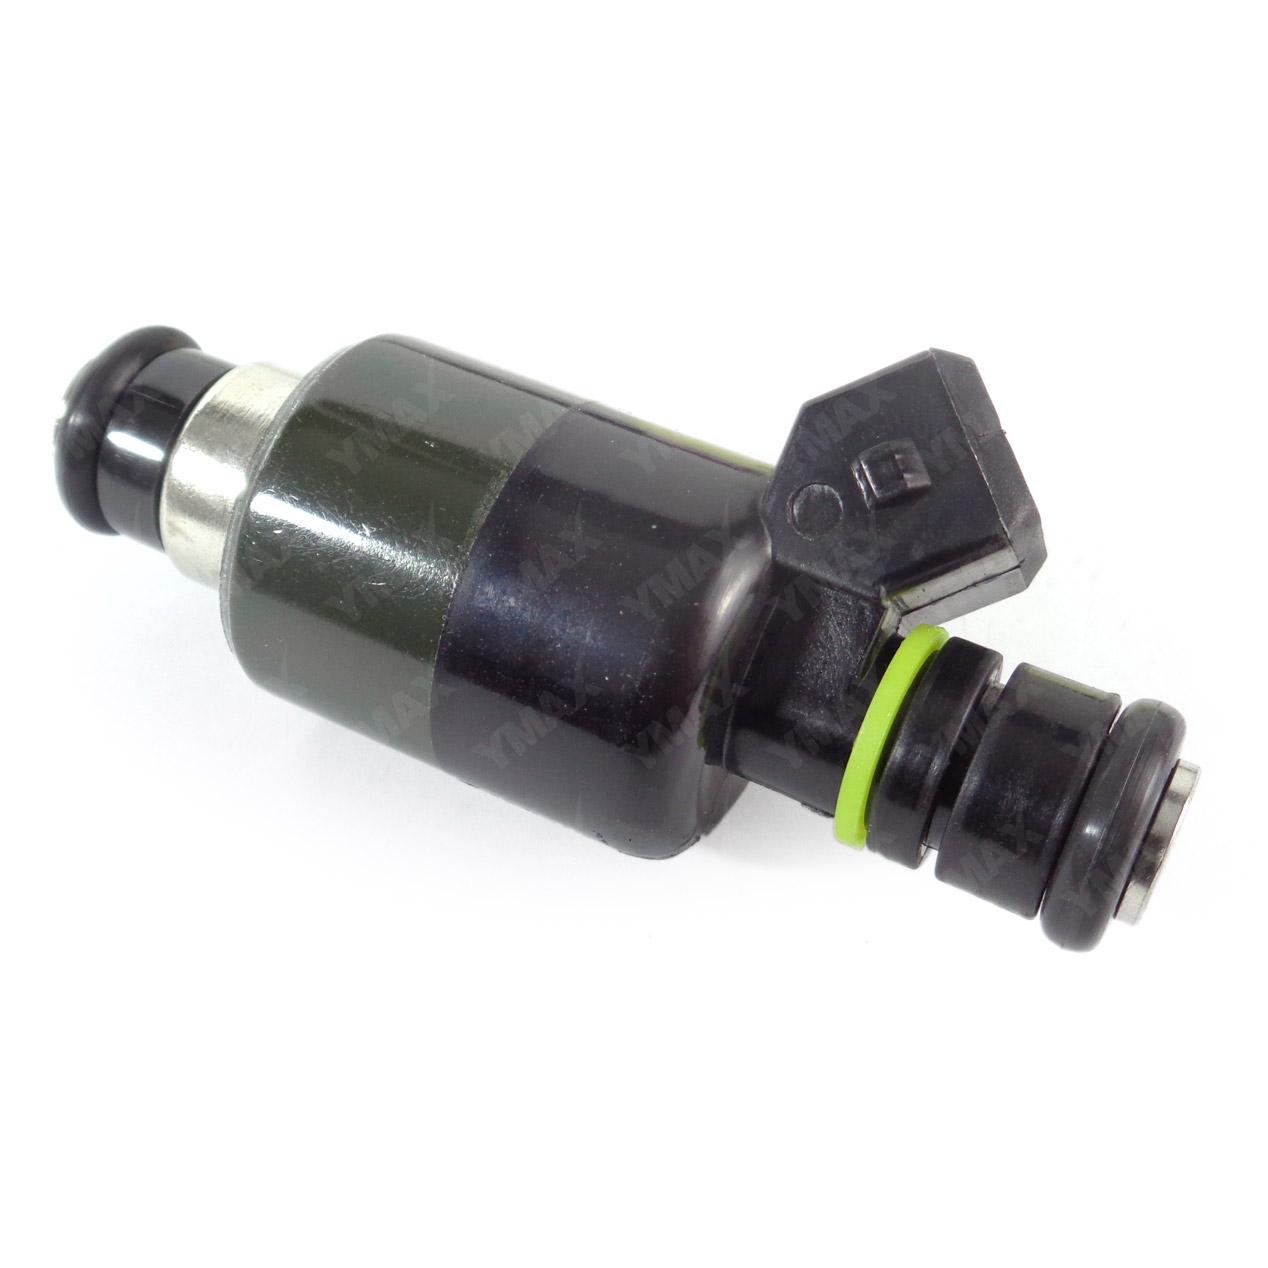 Bico Injetor Combustível CORSA - Motor 1.6 08V MPFI Gasolina